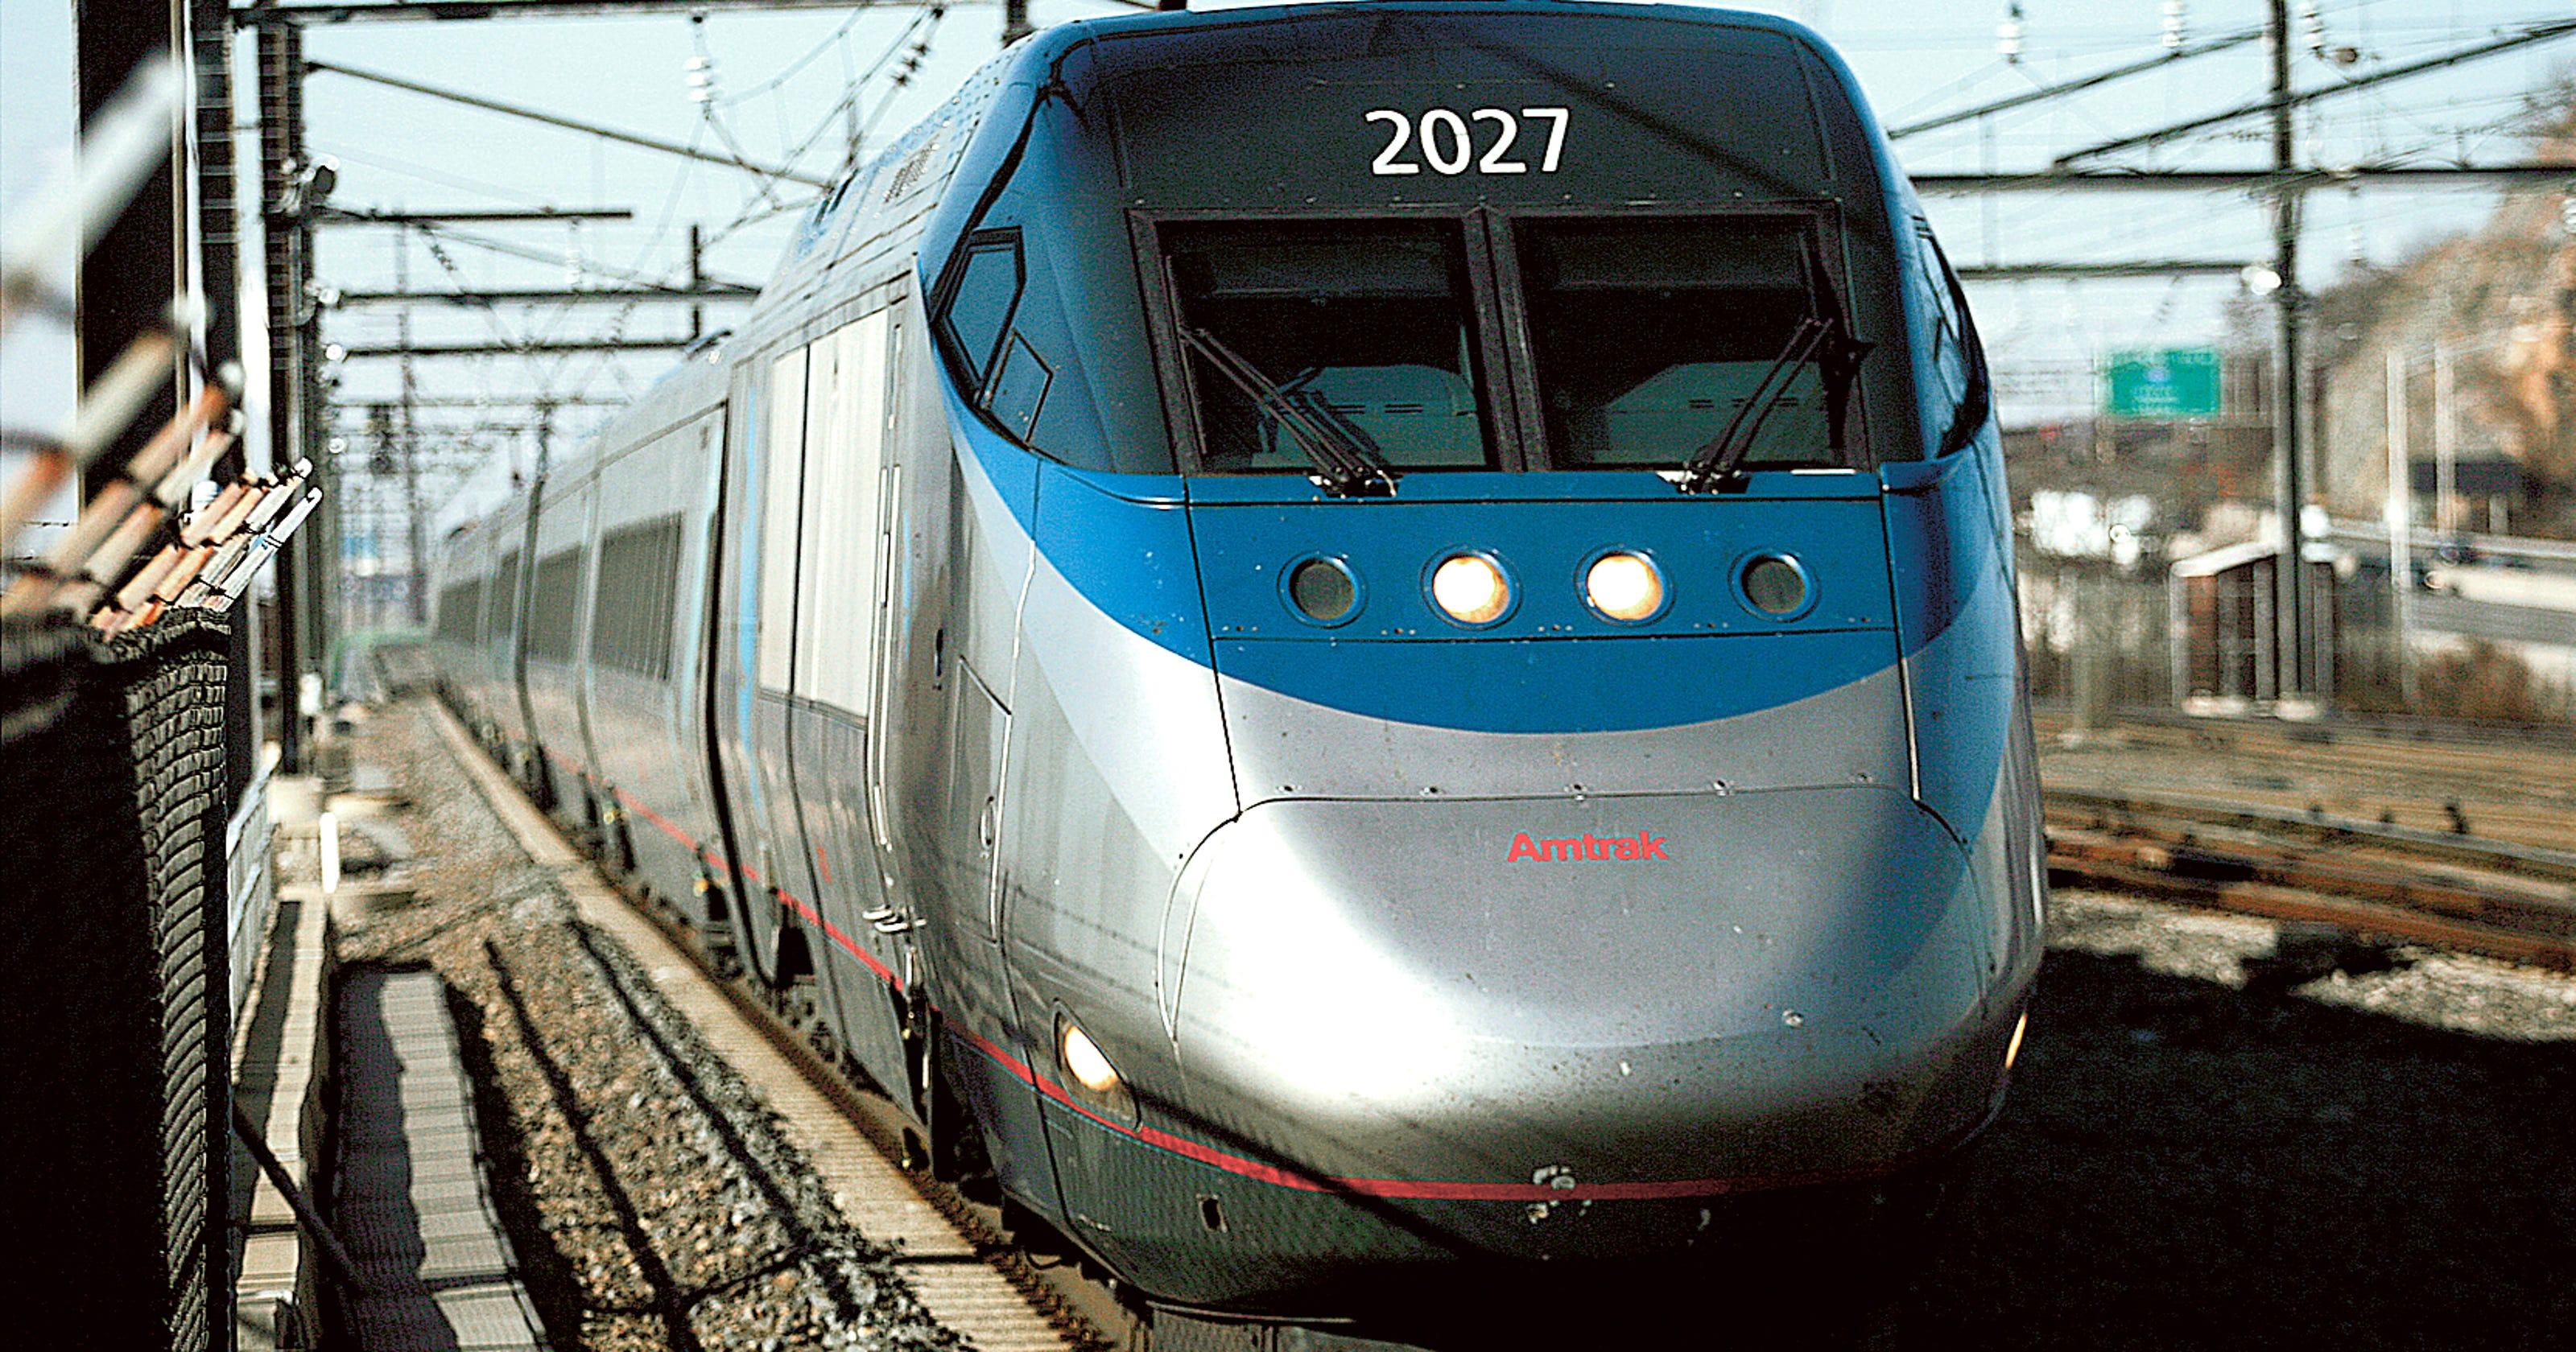 N Y Penn Station To Have Normal Saturday Schedule